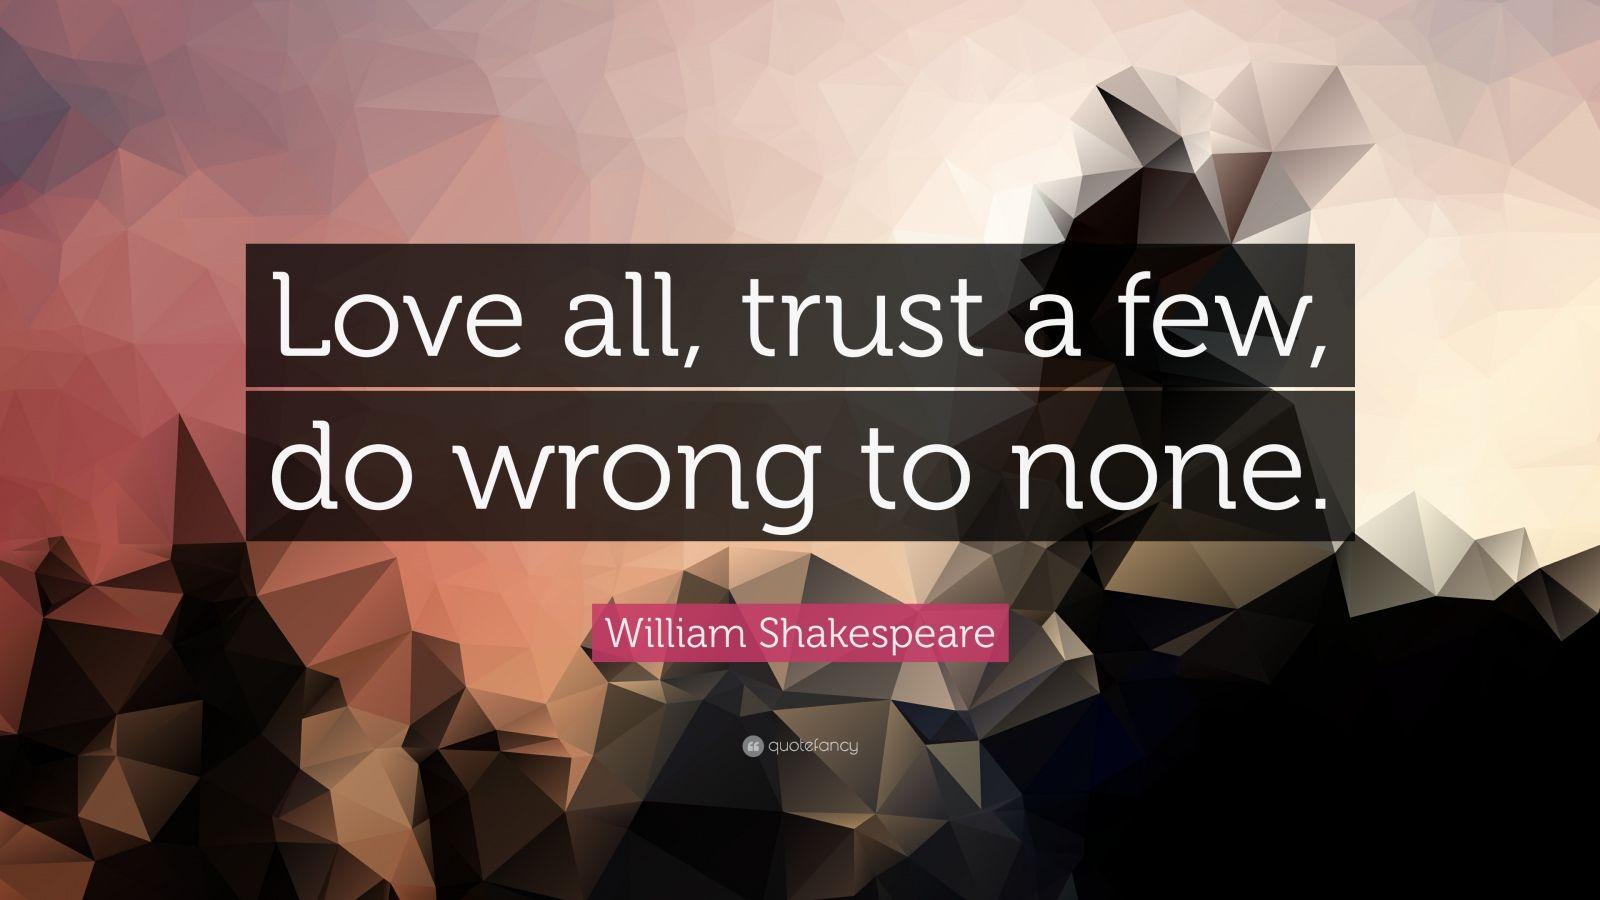 Love Trust Quotes Wallpaper William Shakespeare Quote Love All Trust A Few Do